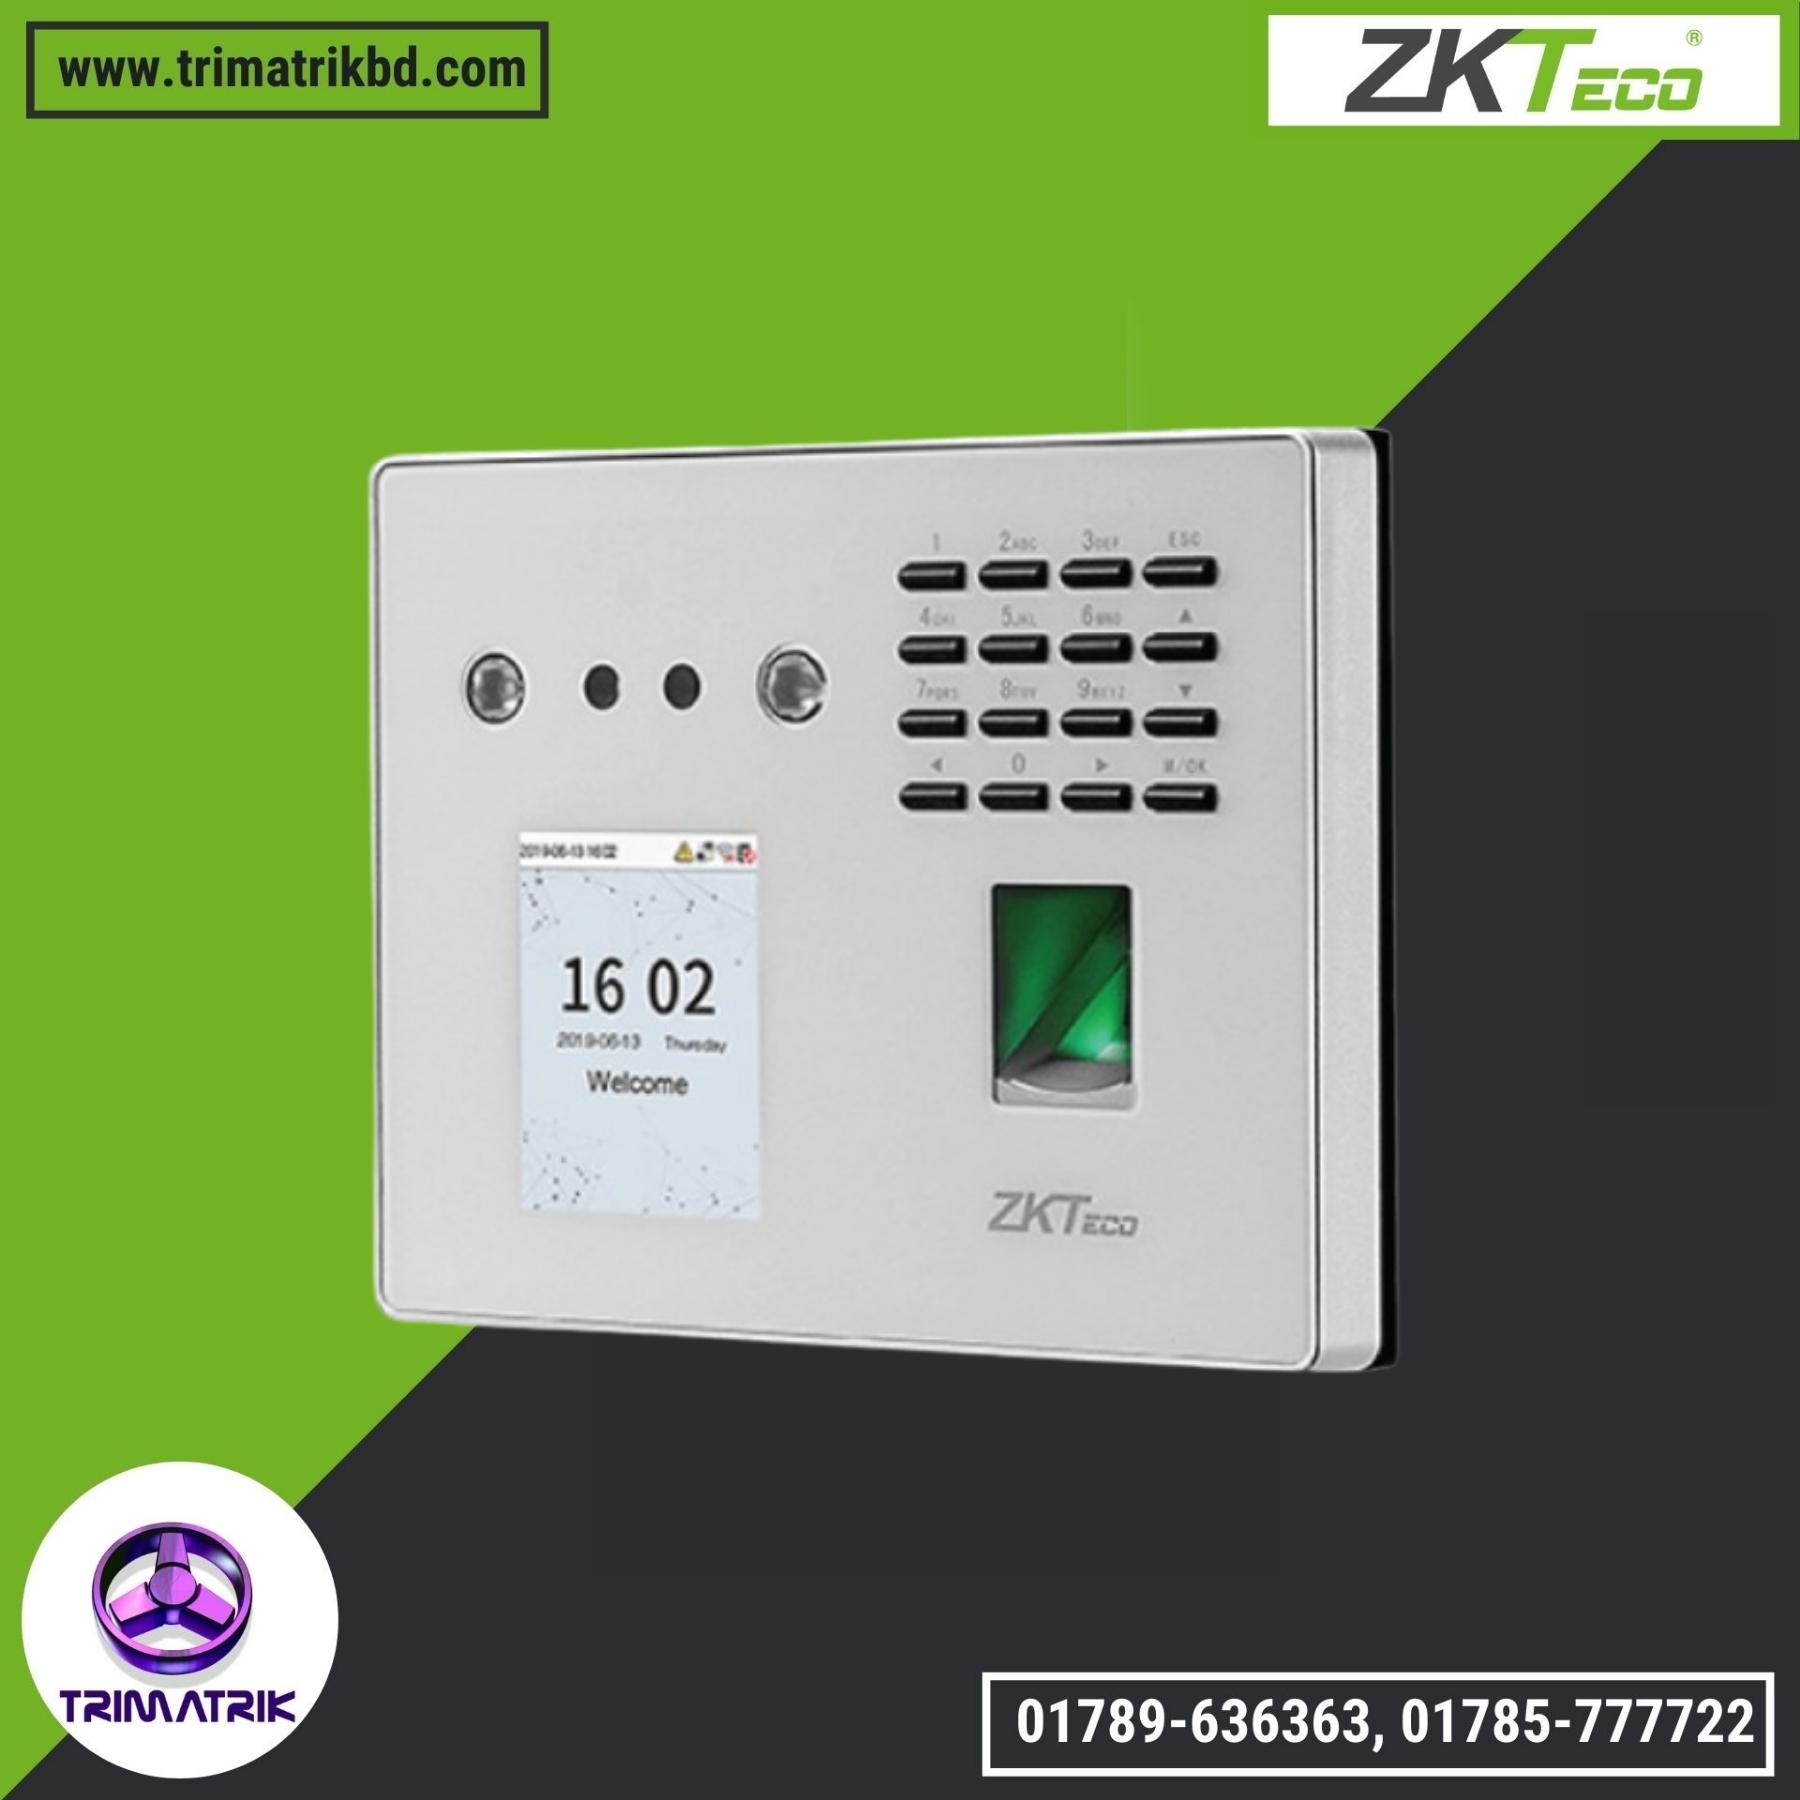 ZKTECO MB560-VL Bangladesh